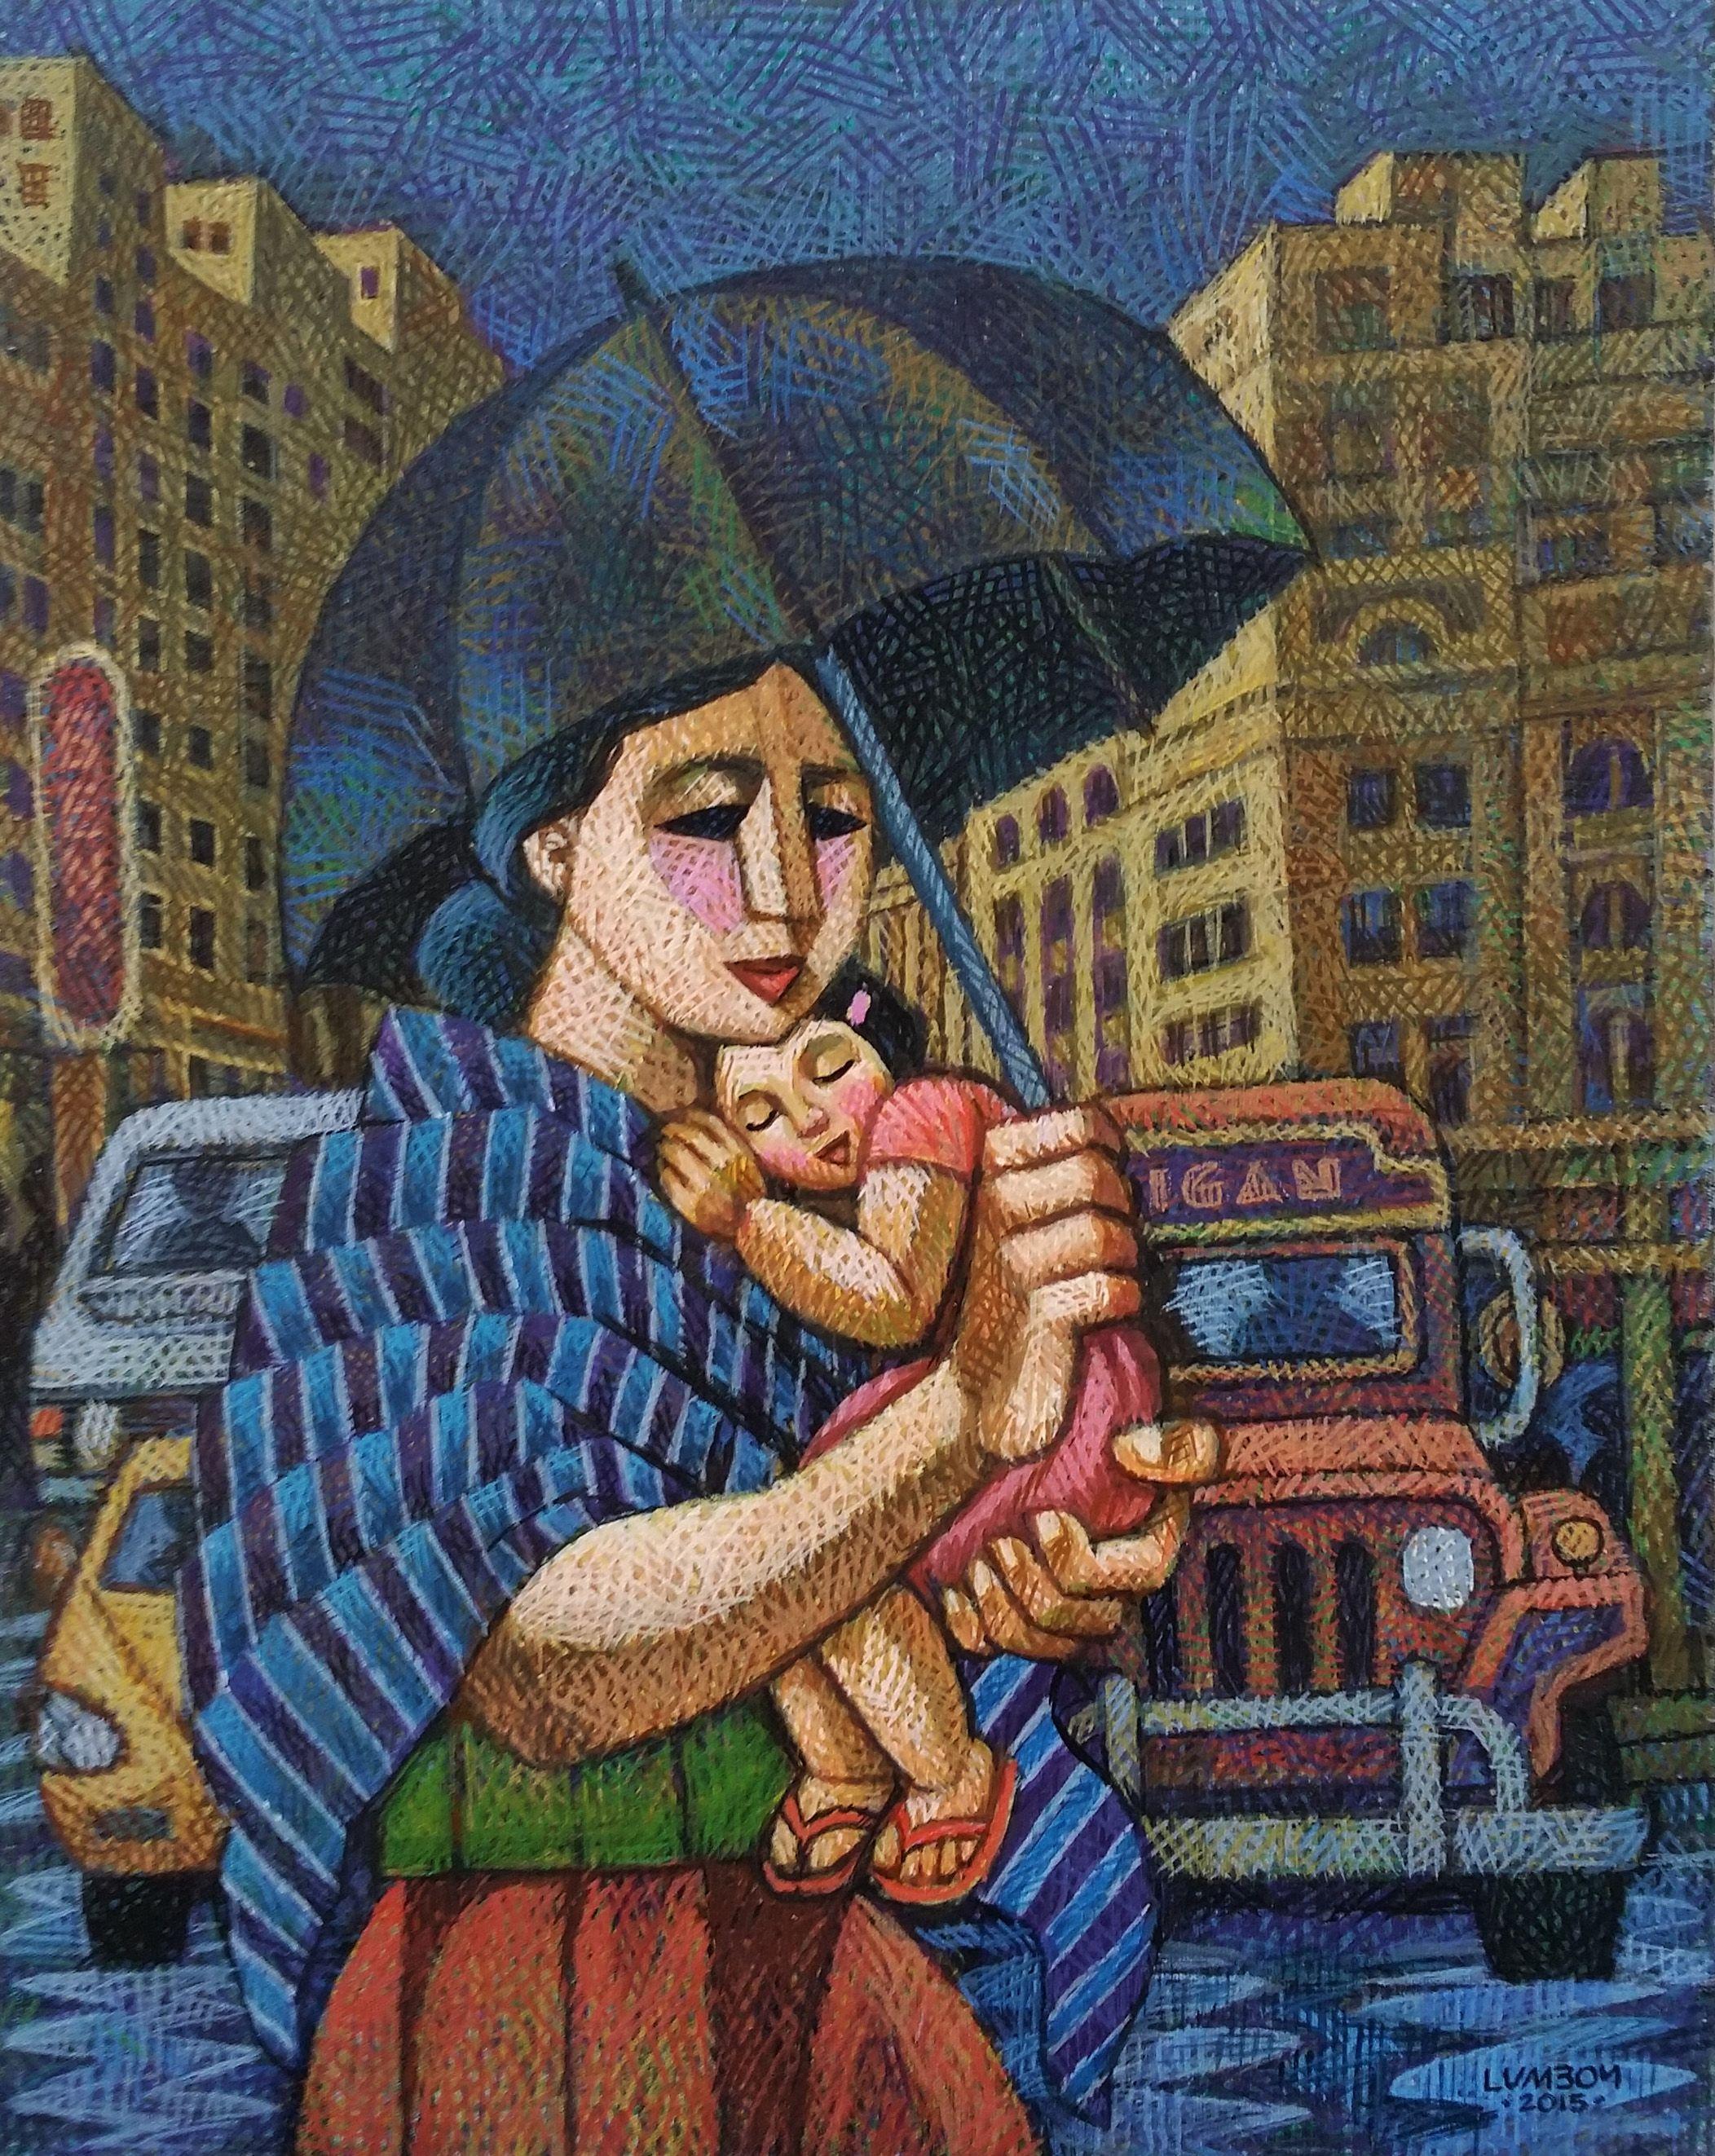 Under Mom's Umbrella by, Ninoy Lumboy, a Filipino artist